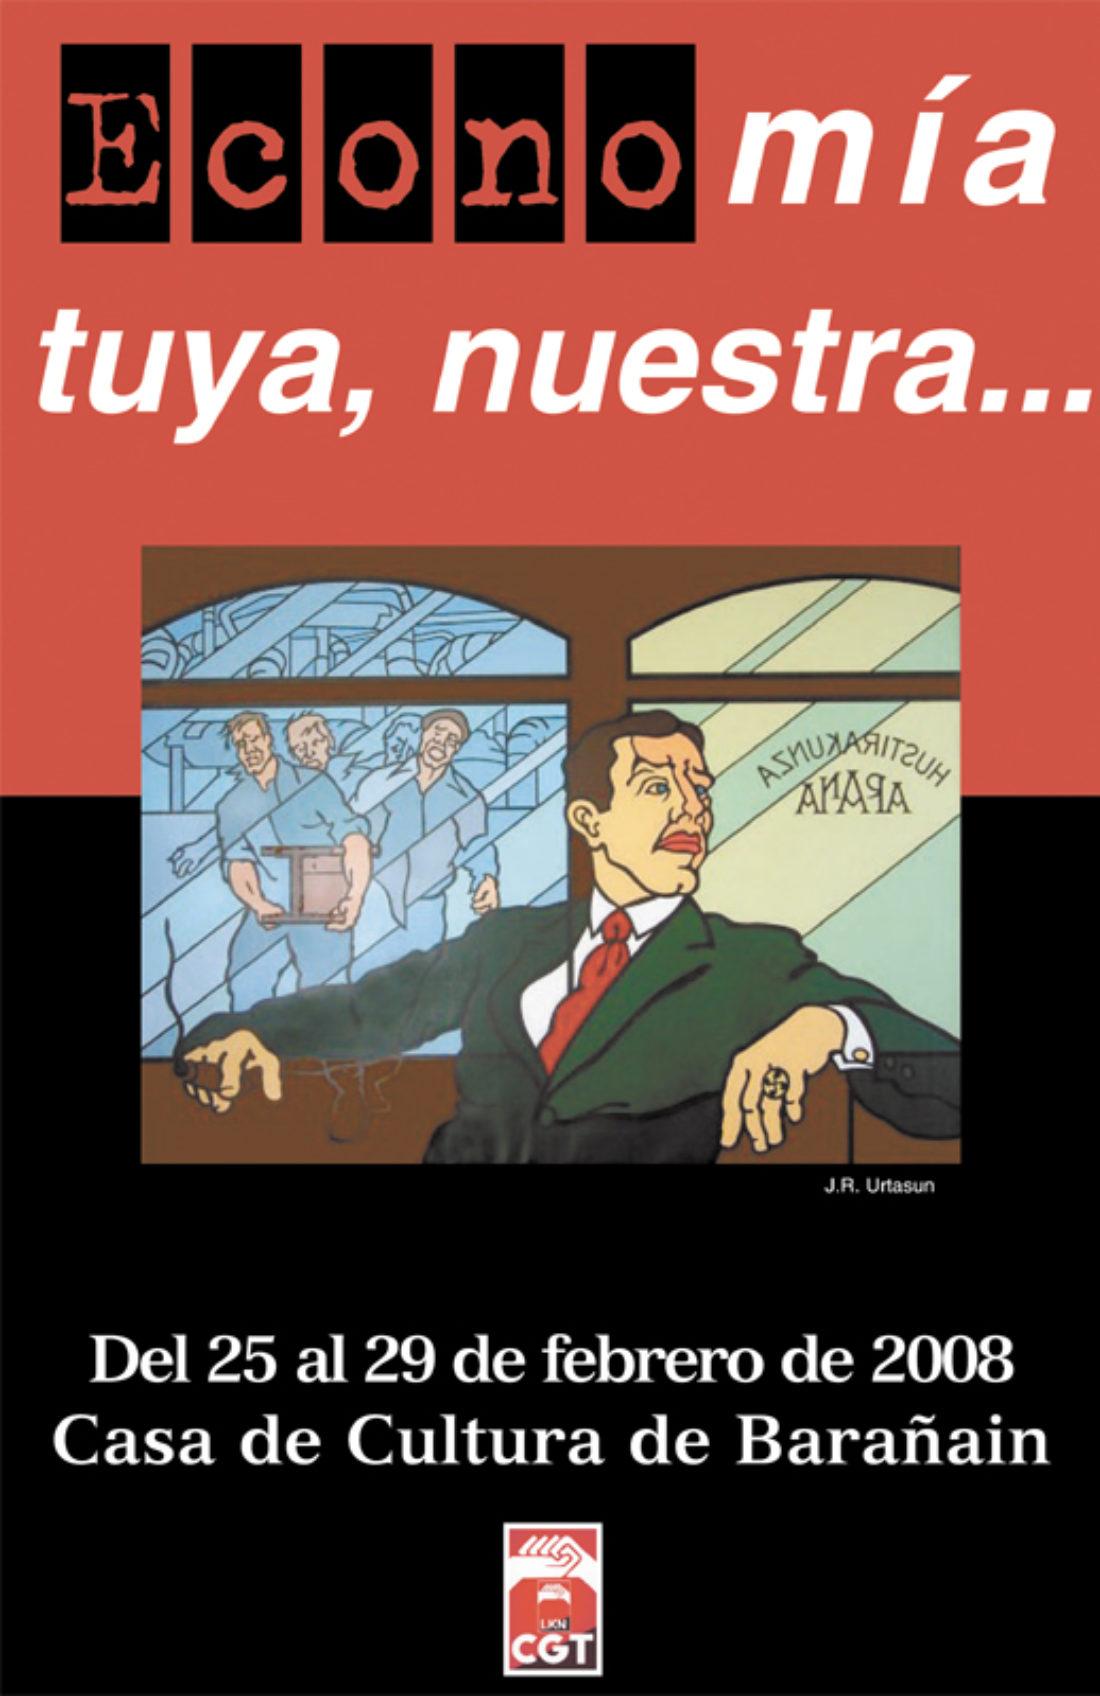 25-29 de febrero, CGT Iruñea: jornadas sobre economía